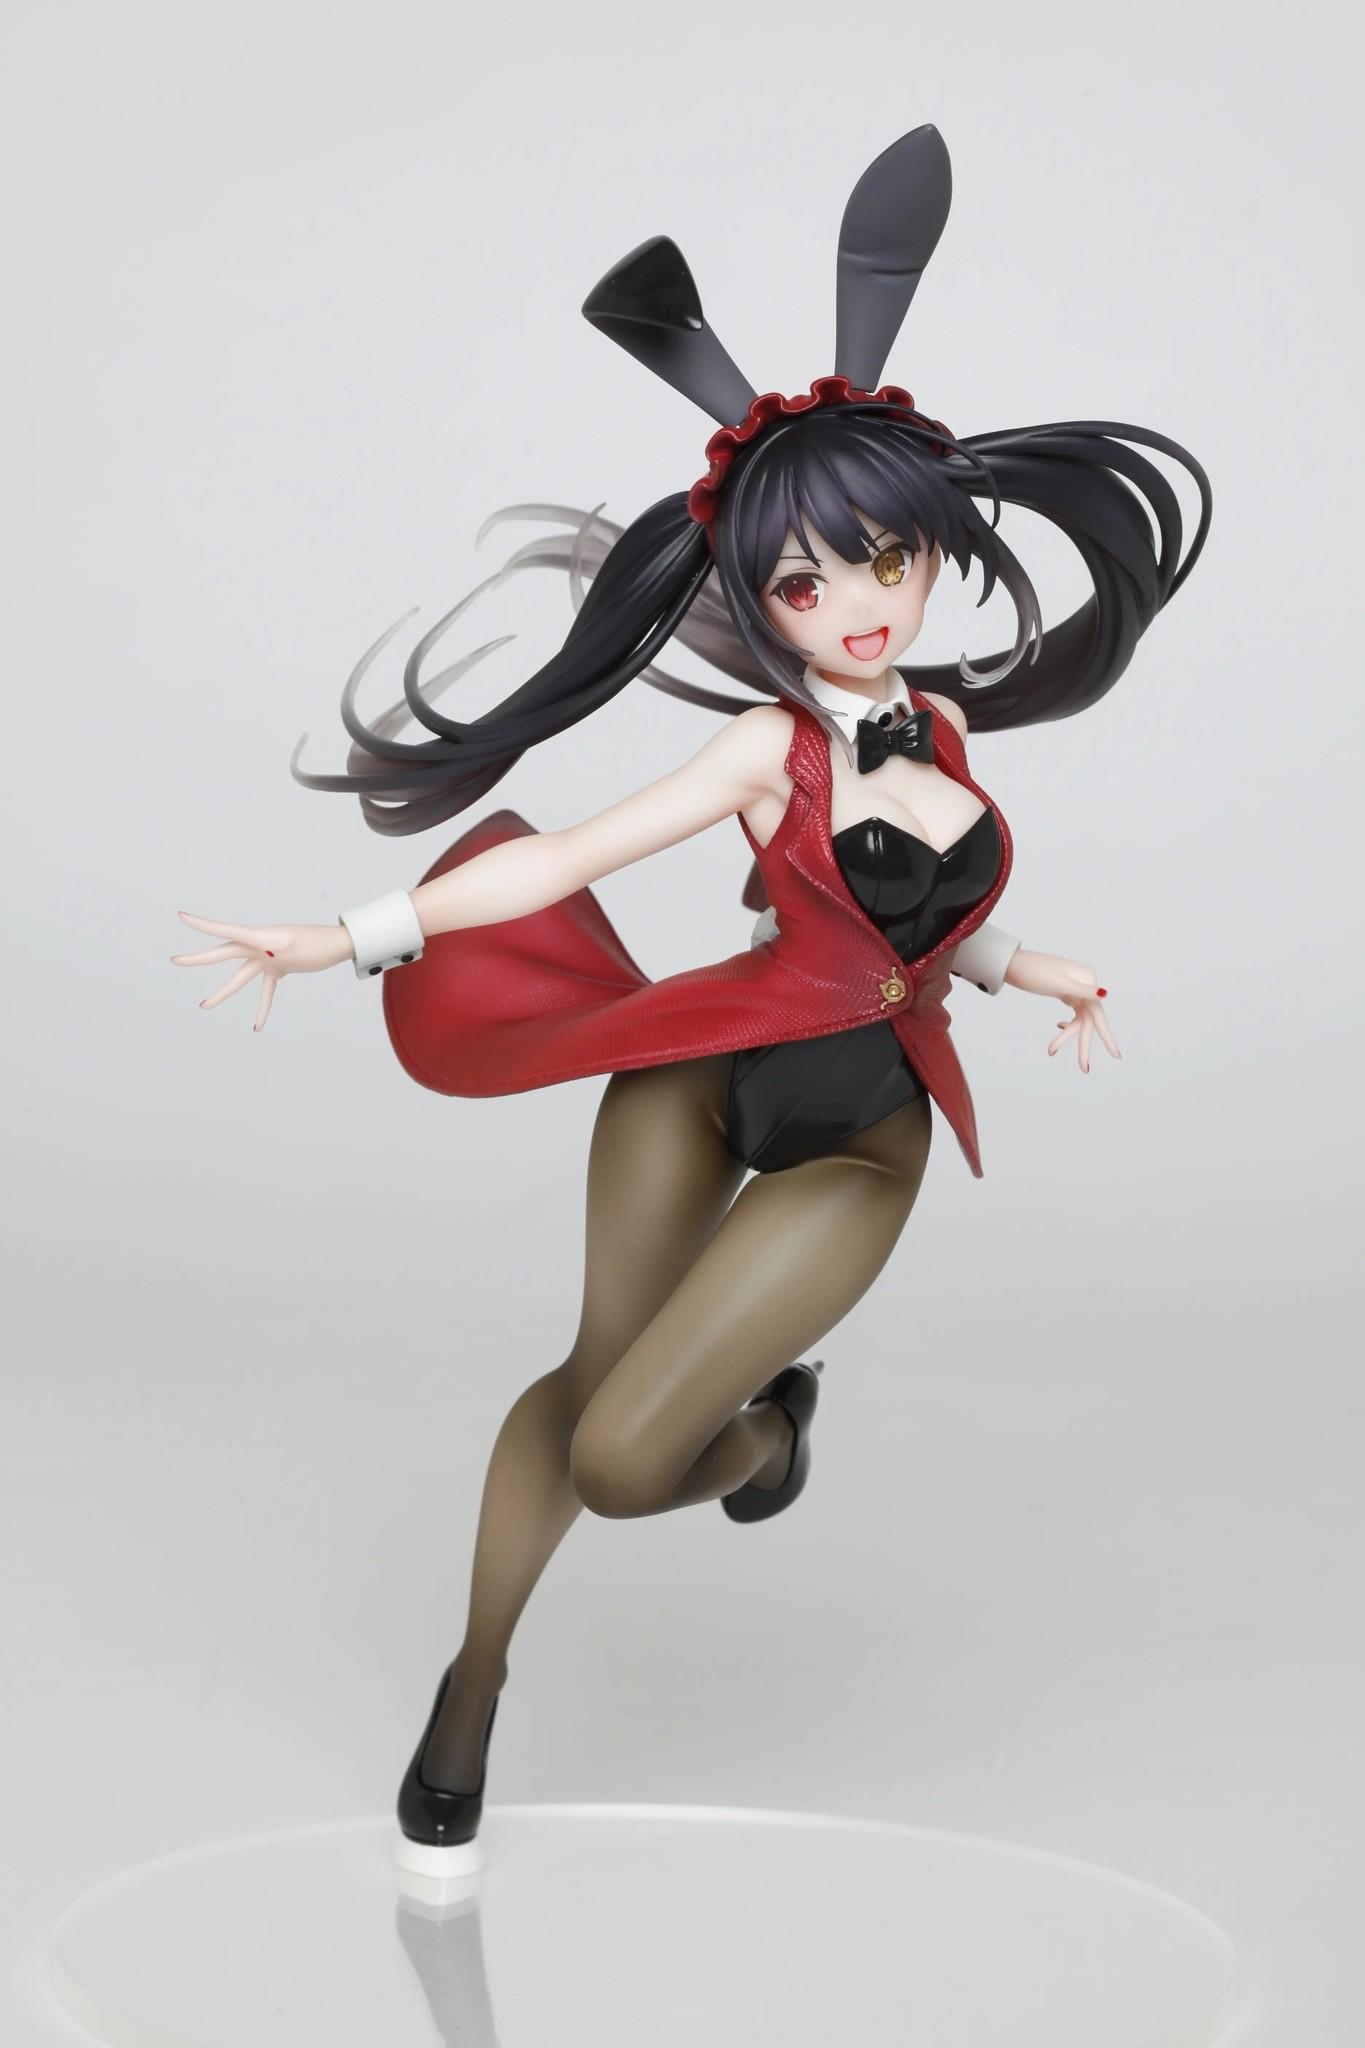 Kurumi Tokisaki Figure, Coreful, Bunny Ver, Date A Bullet, Taito